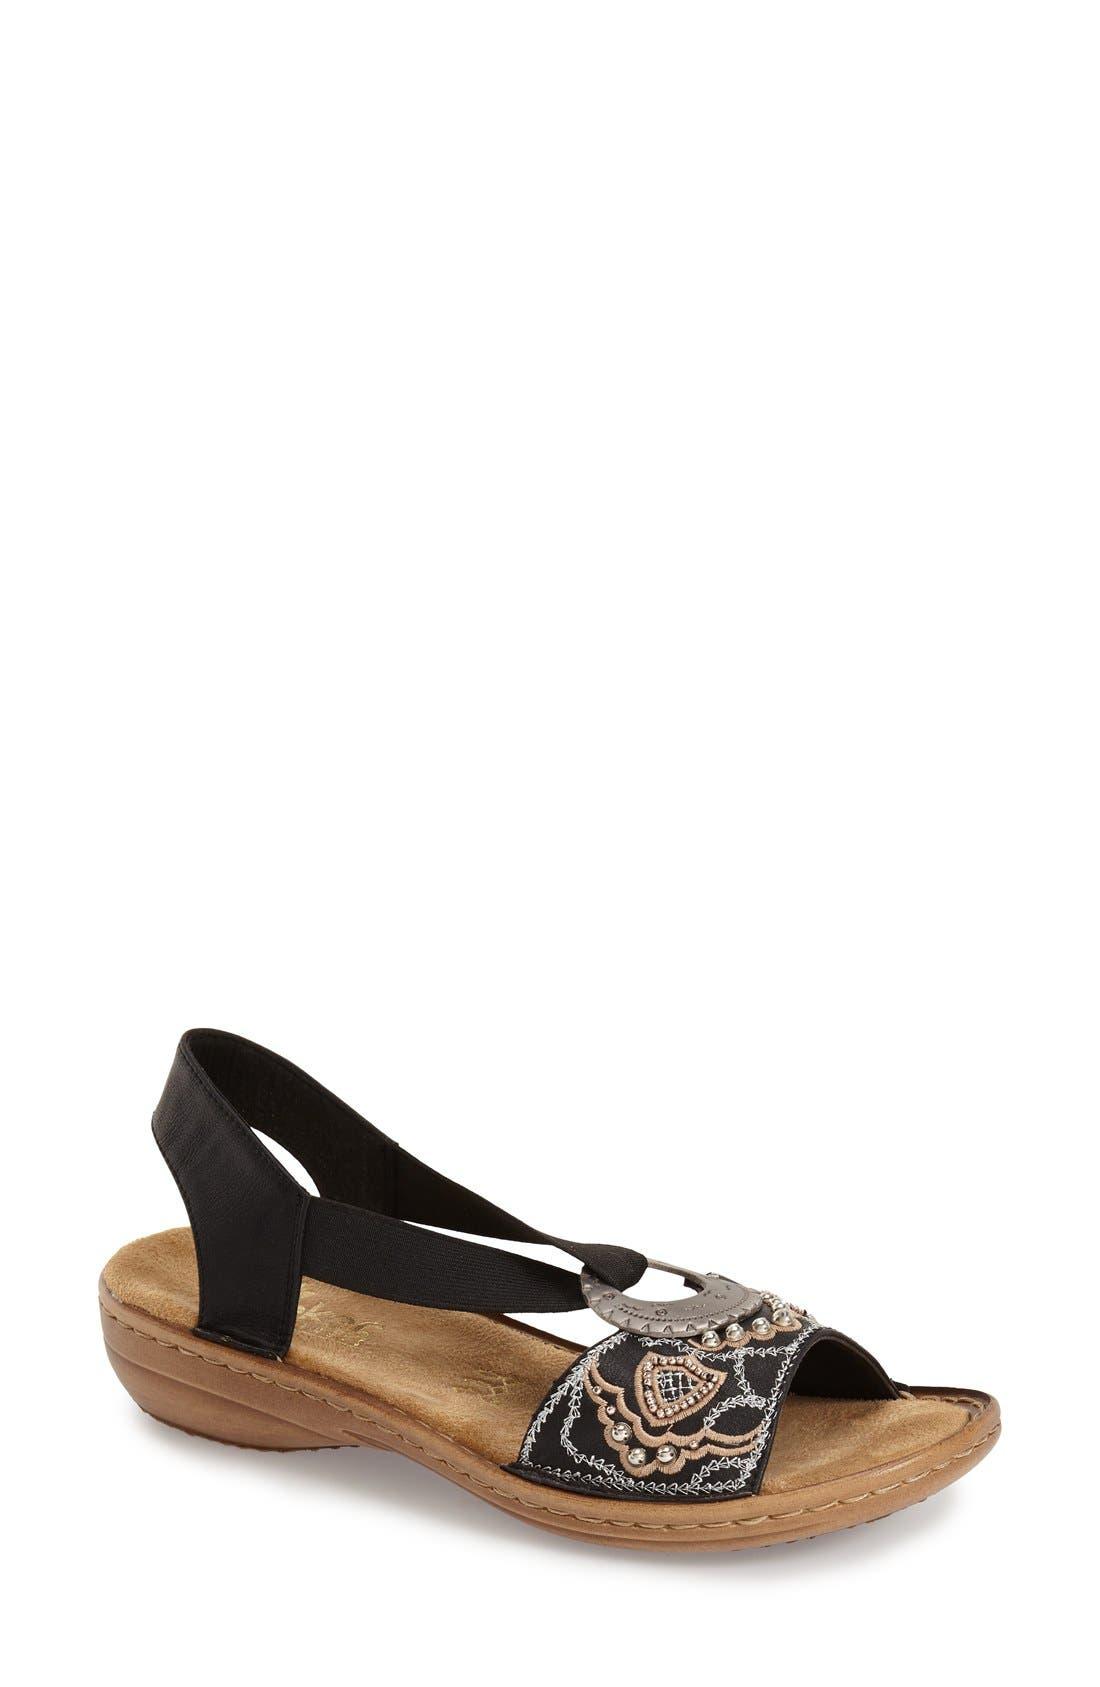 RIEKER ANTISTRESS 'Regina' Sandal, Main, color, BLACK FABRIC